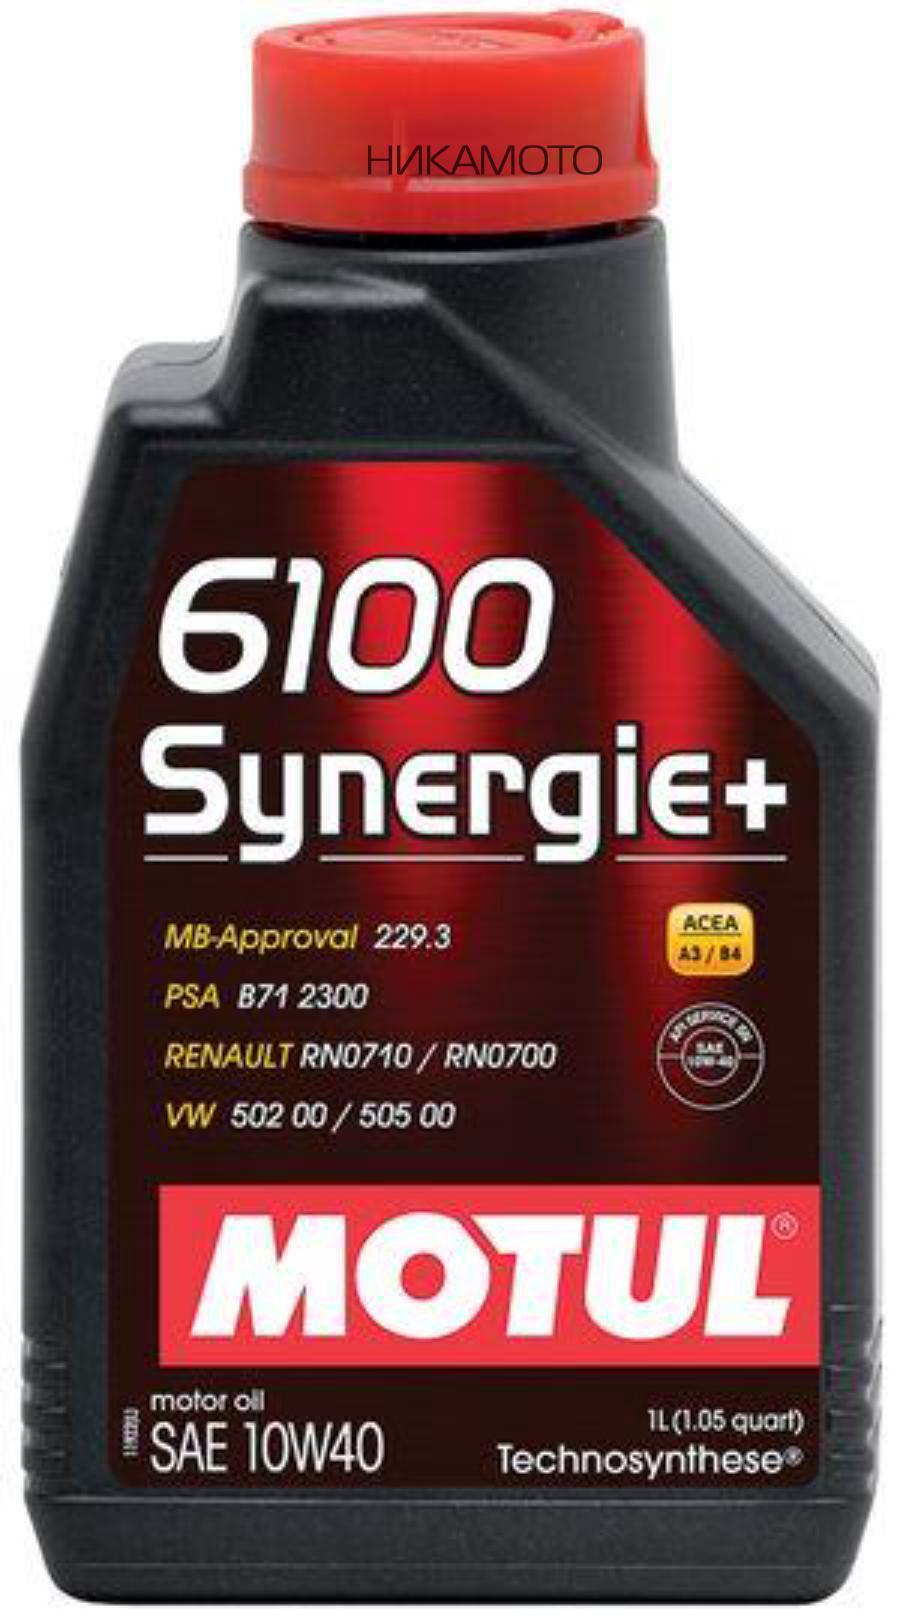 Масло моторное Technosynthese 1л 10w40 6100 + Synergie A3/B4, SN/CF MOTUL 102781